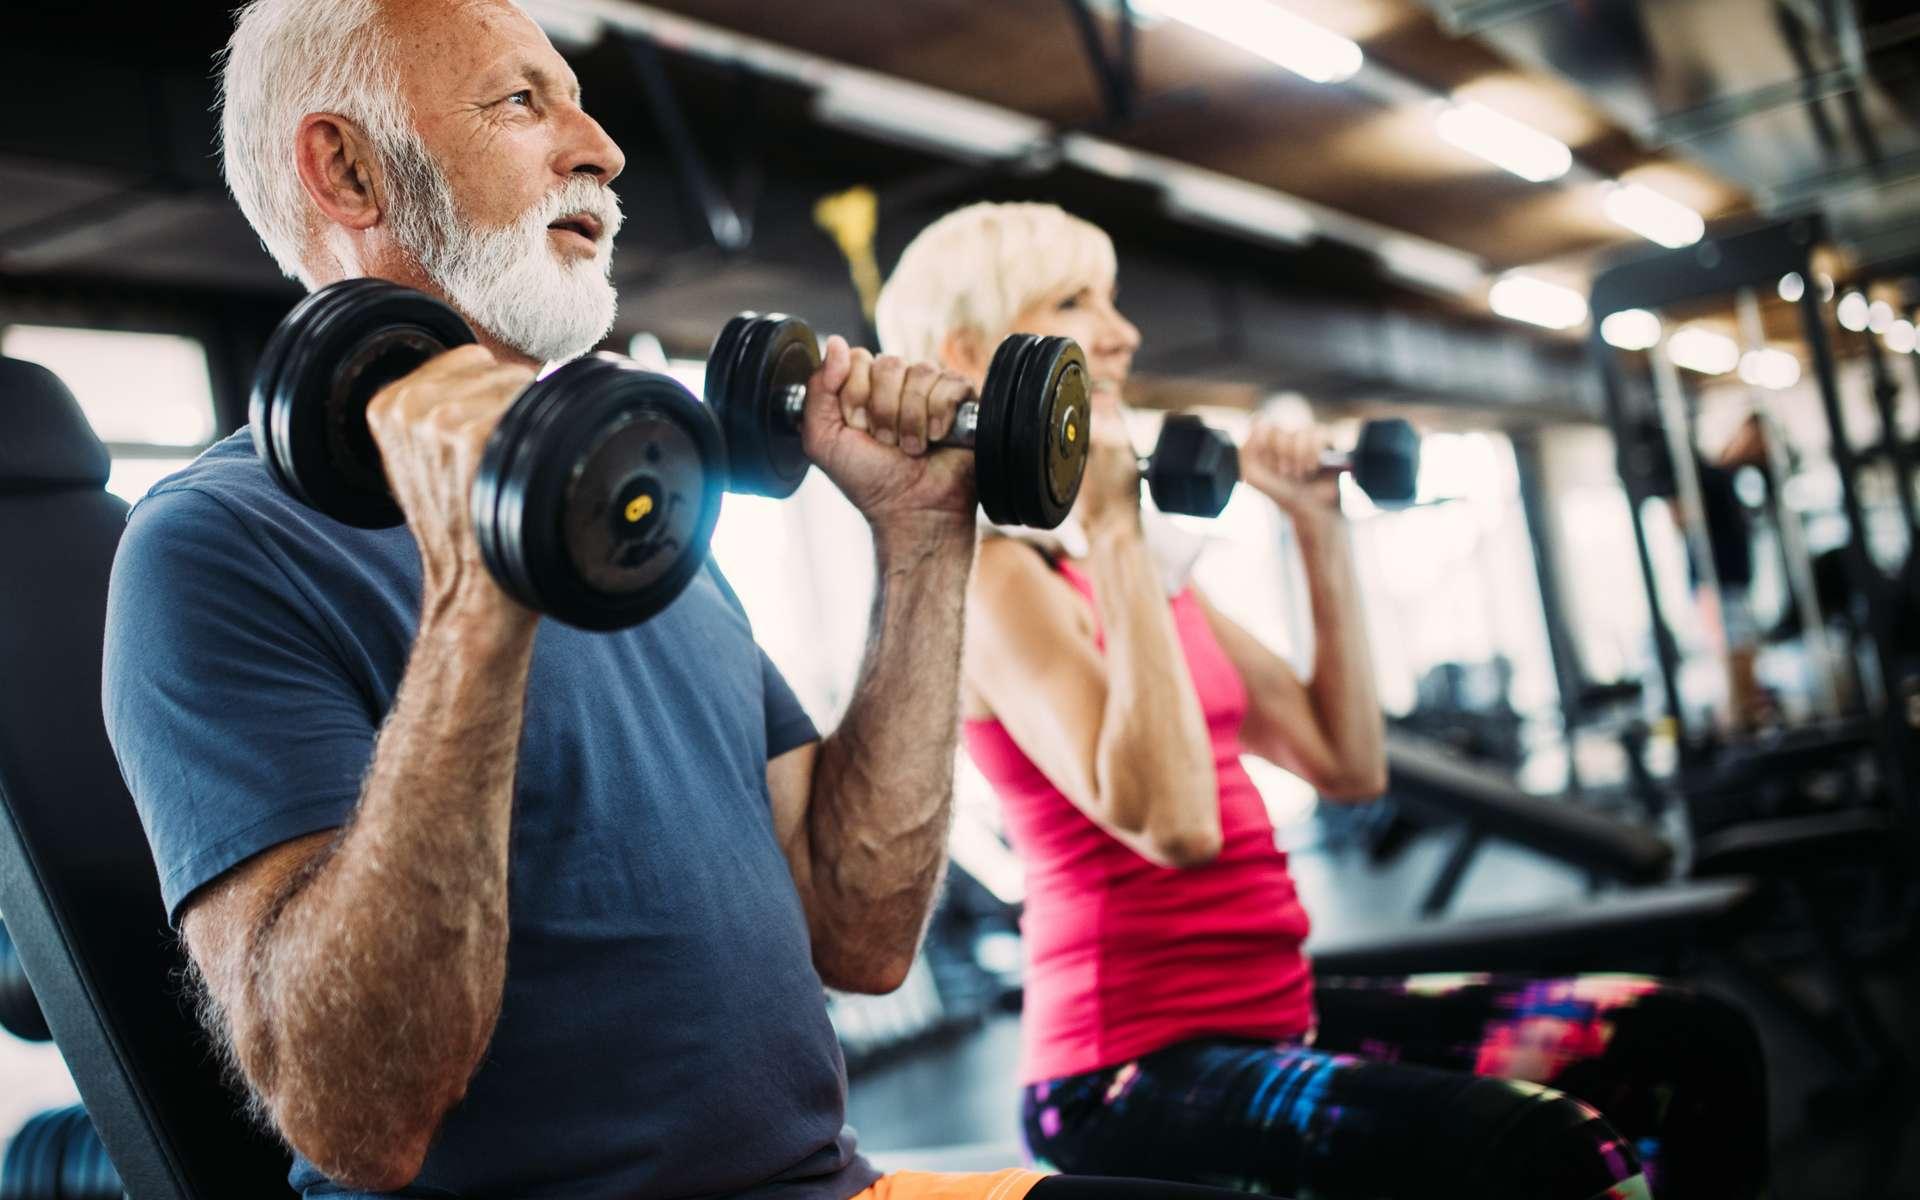 Longévité : faites du sport, peu importe l'intensité. © NDABCREATIVITY, Adobe Stock